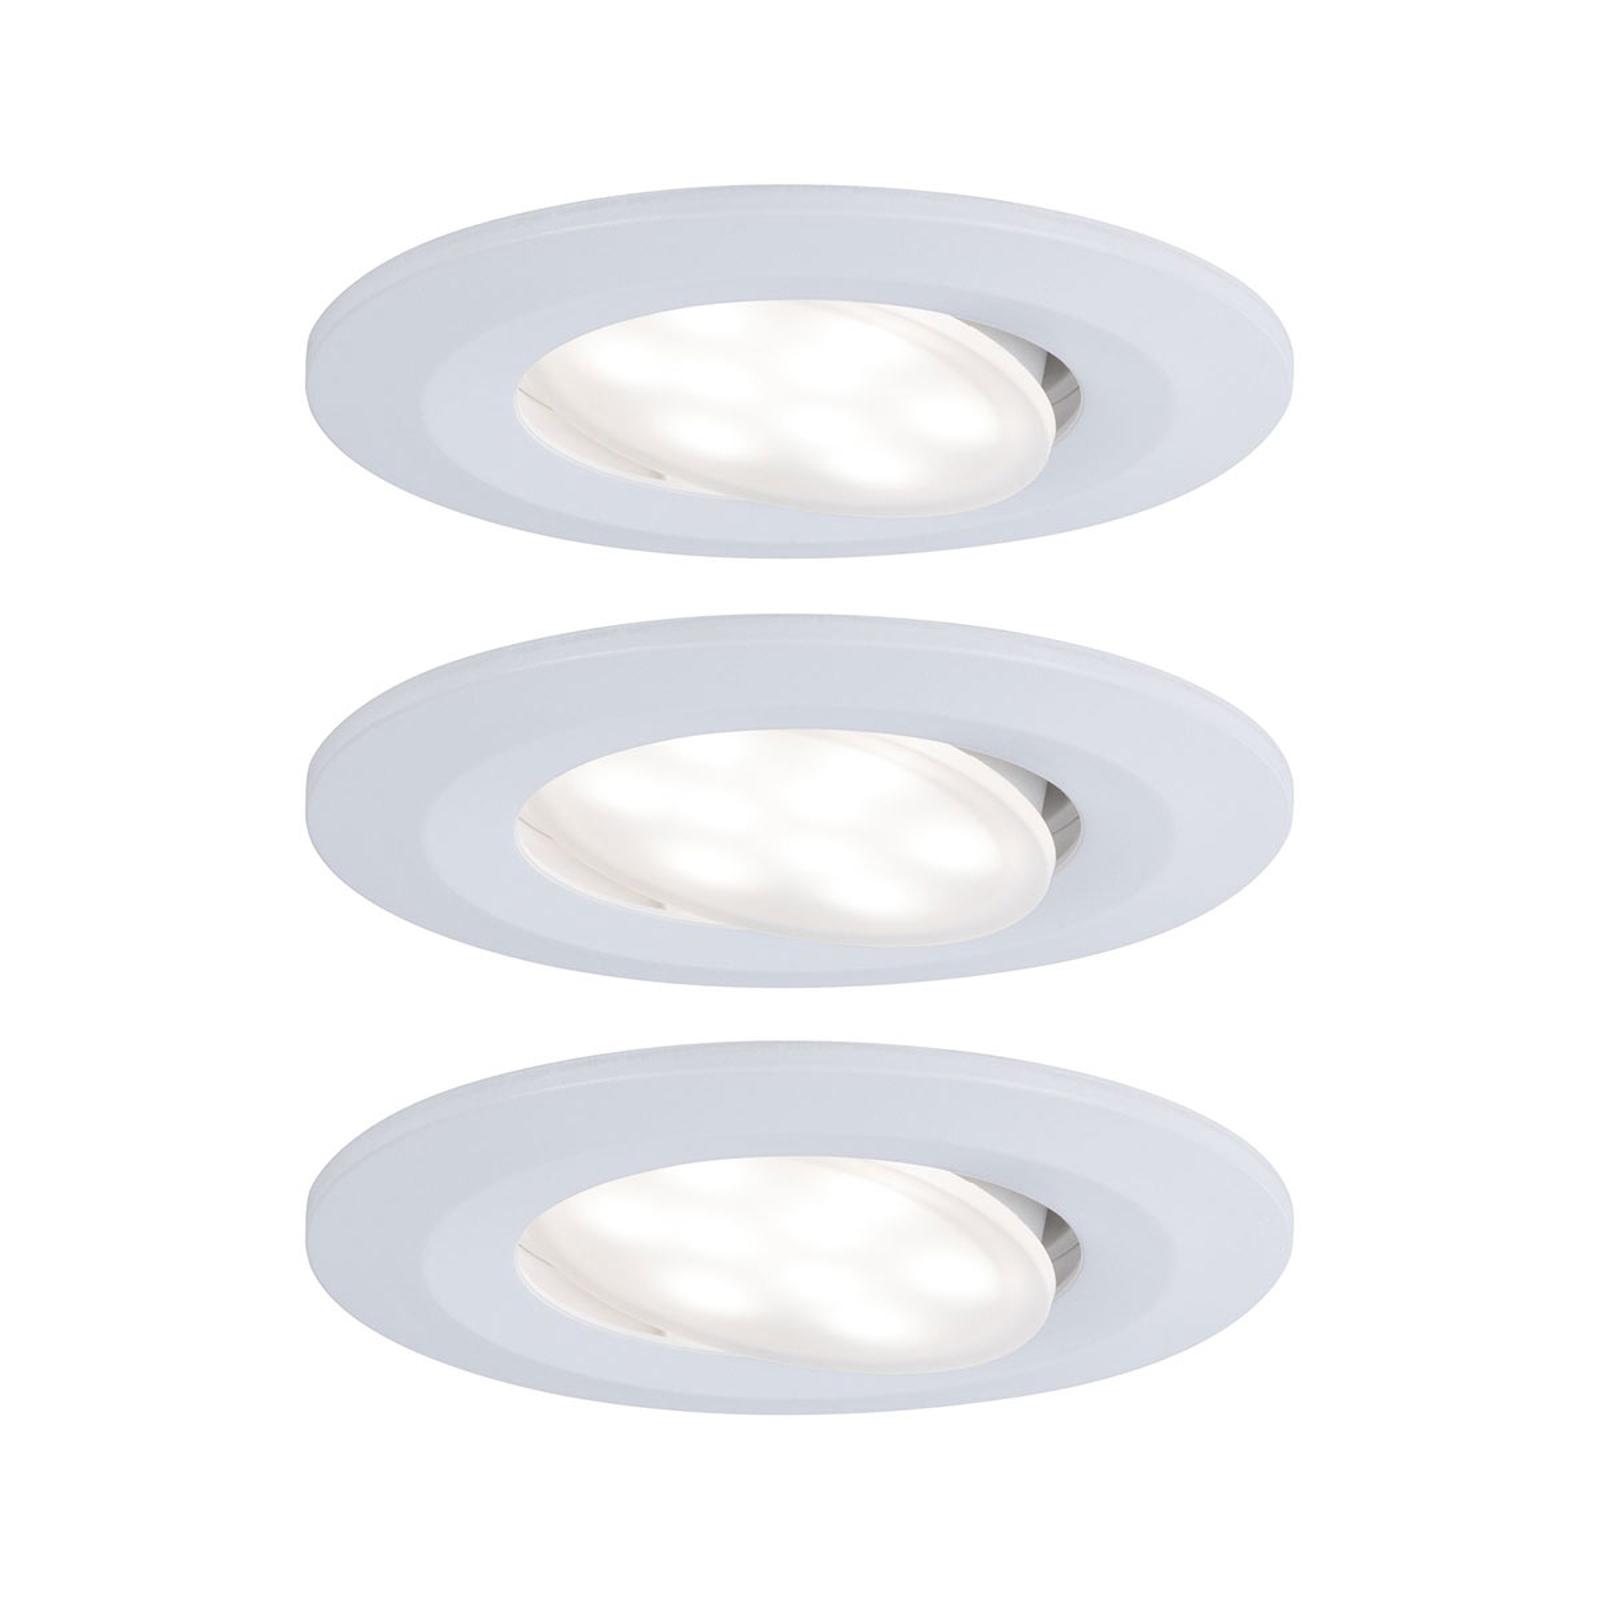 Paulmann LED-Einbauspot Calla dimmbar 3er weiß